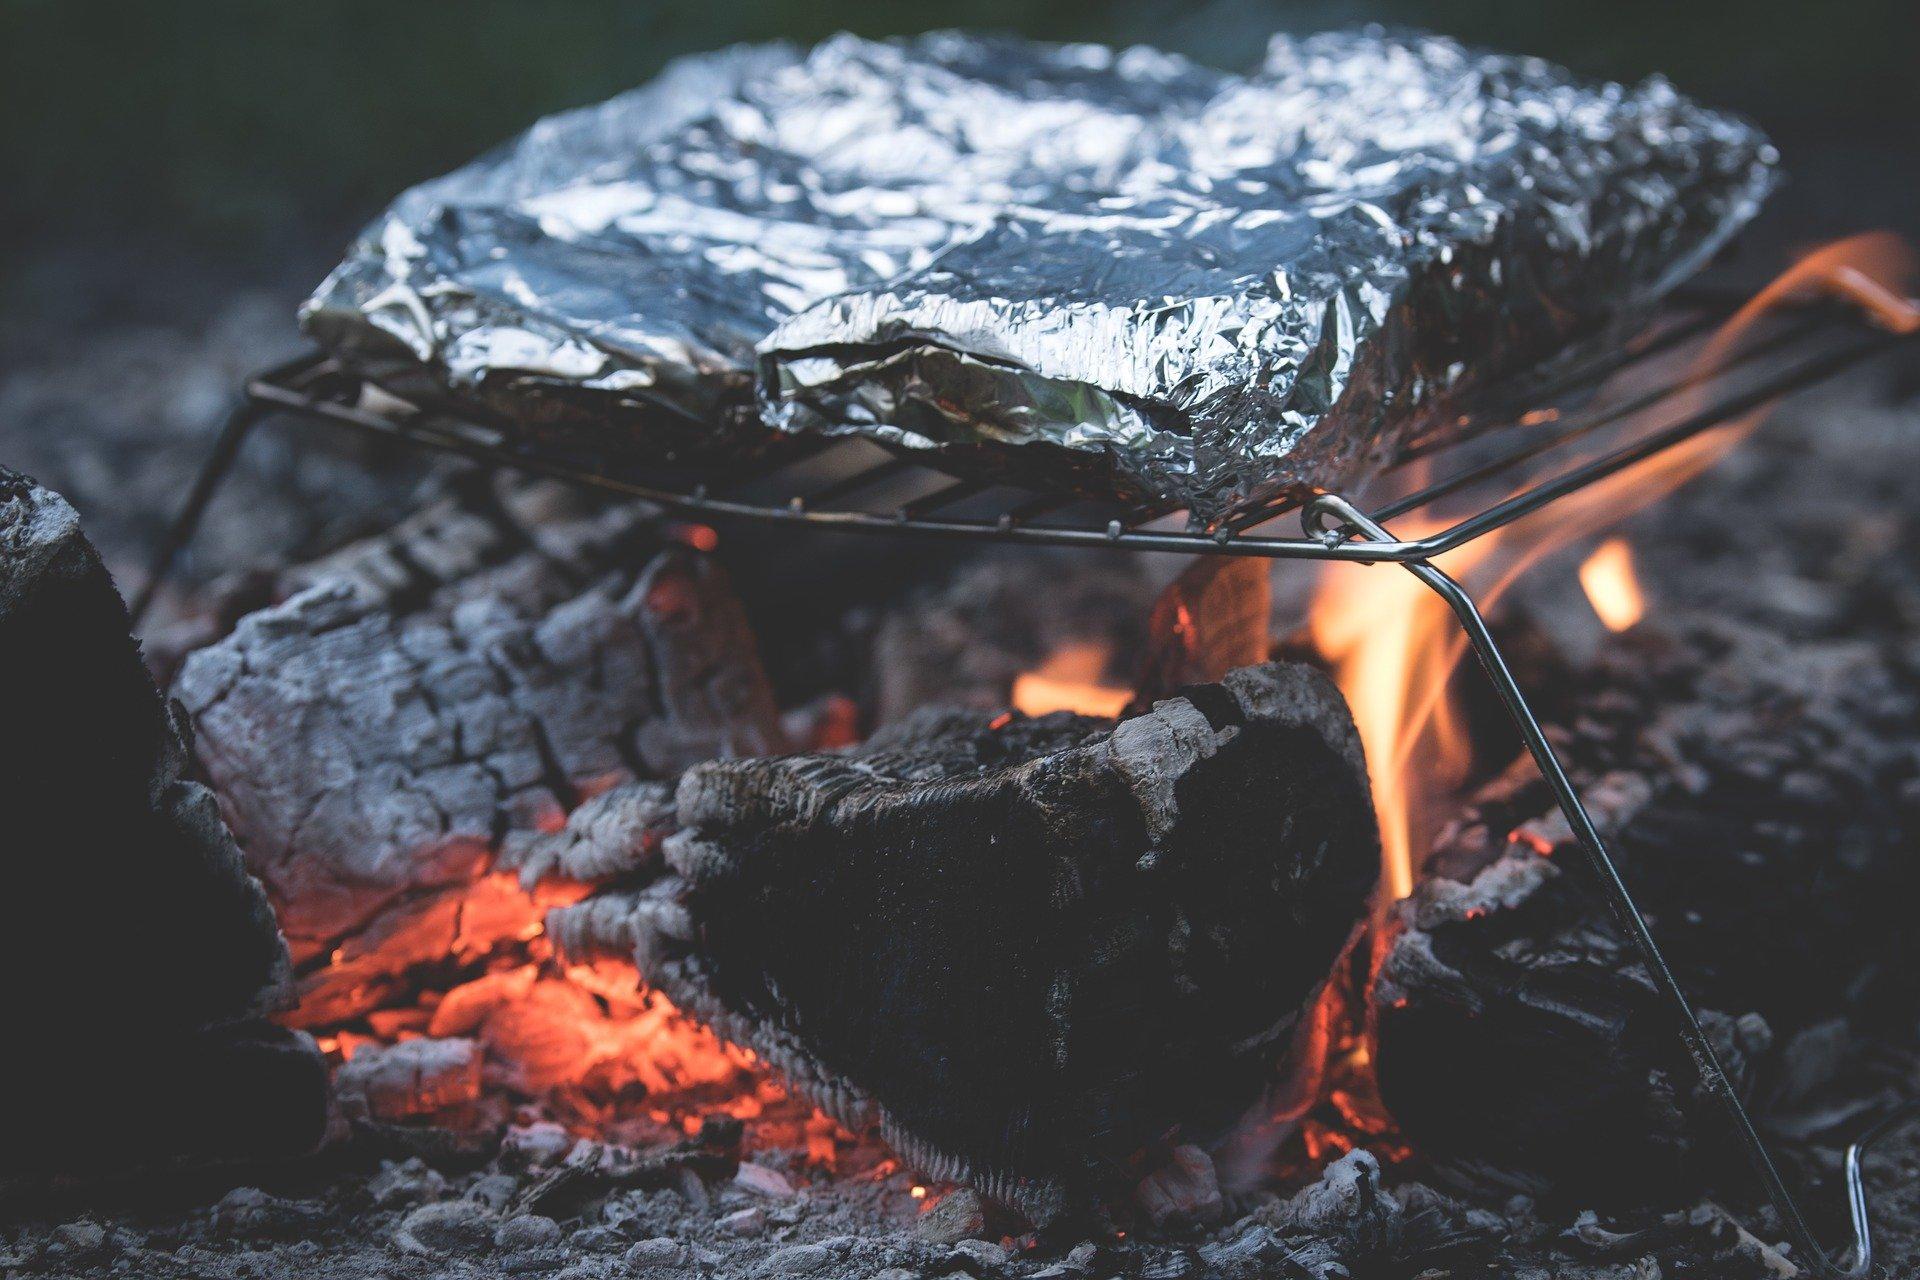 Bonfire Cooking - DIY Alternative to a BBQ - Climadoor